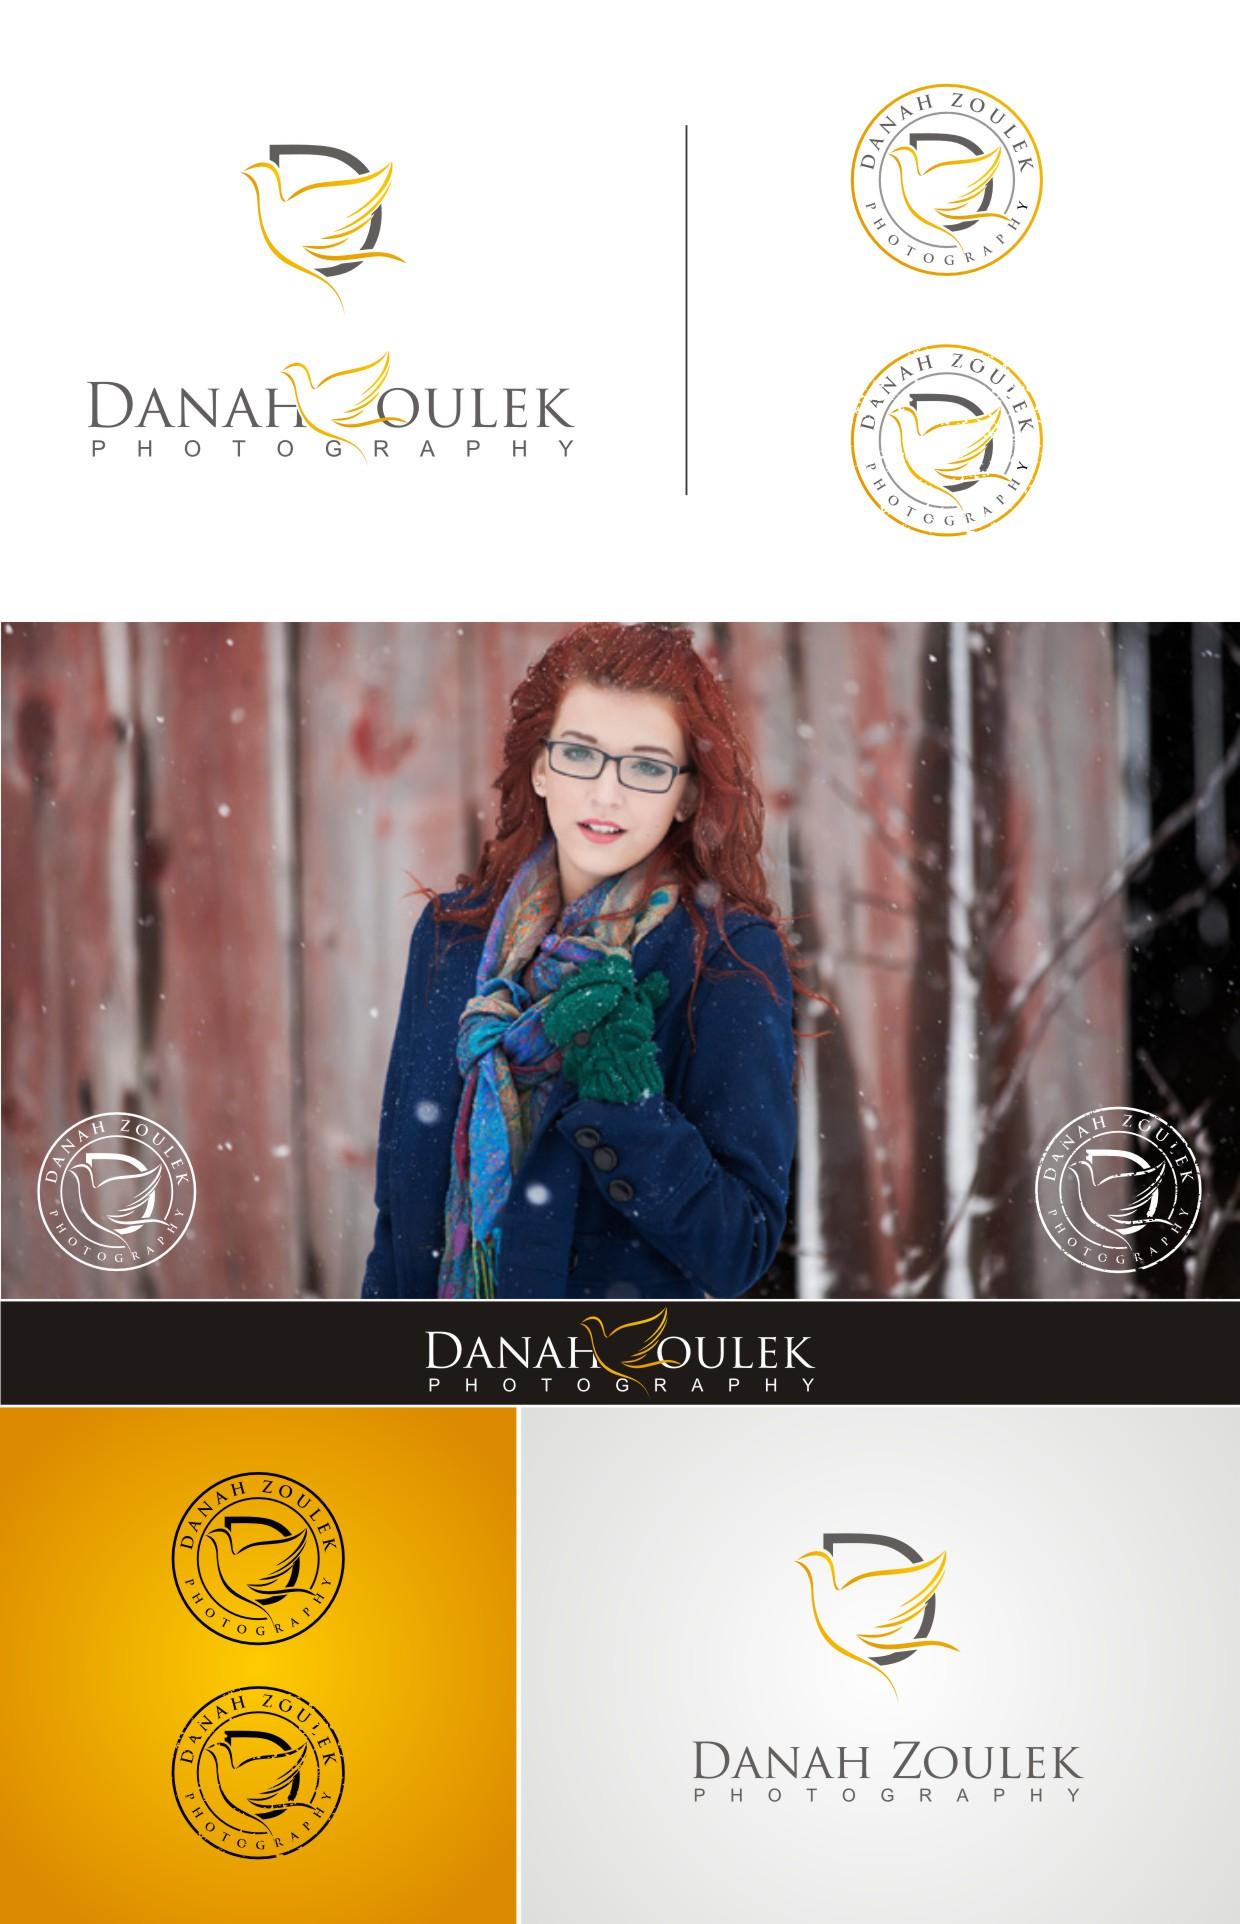 logo for Danah Zoulek Photography